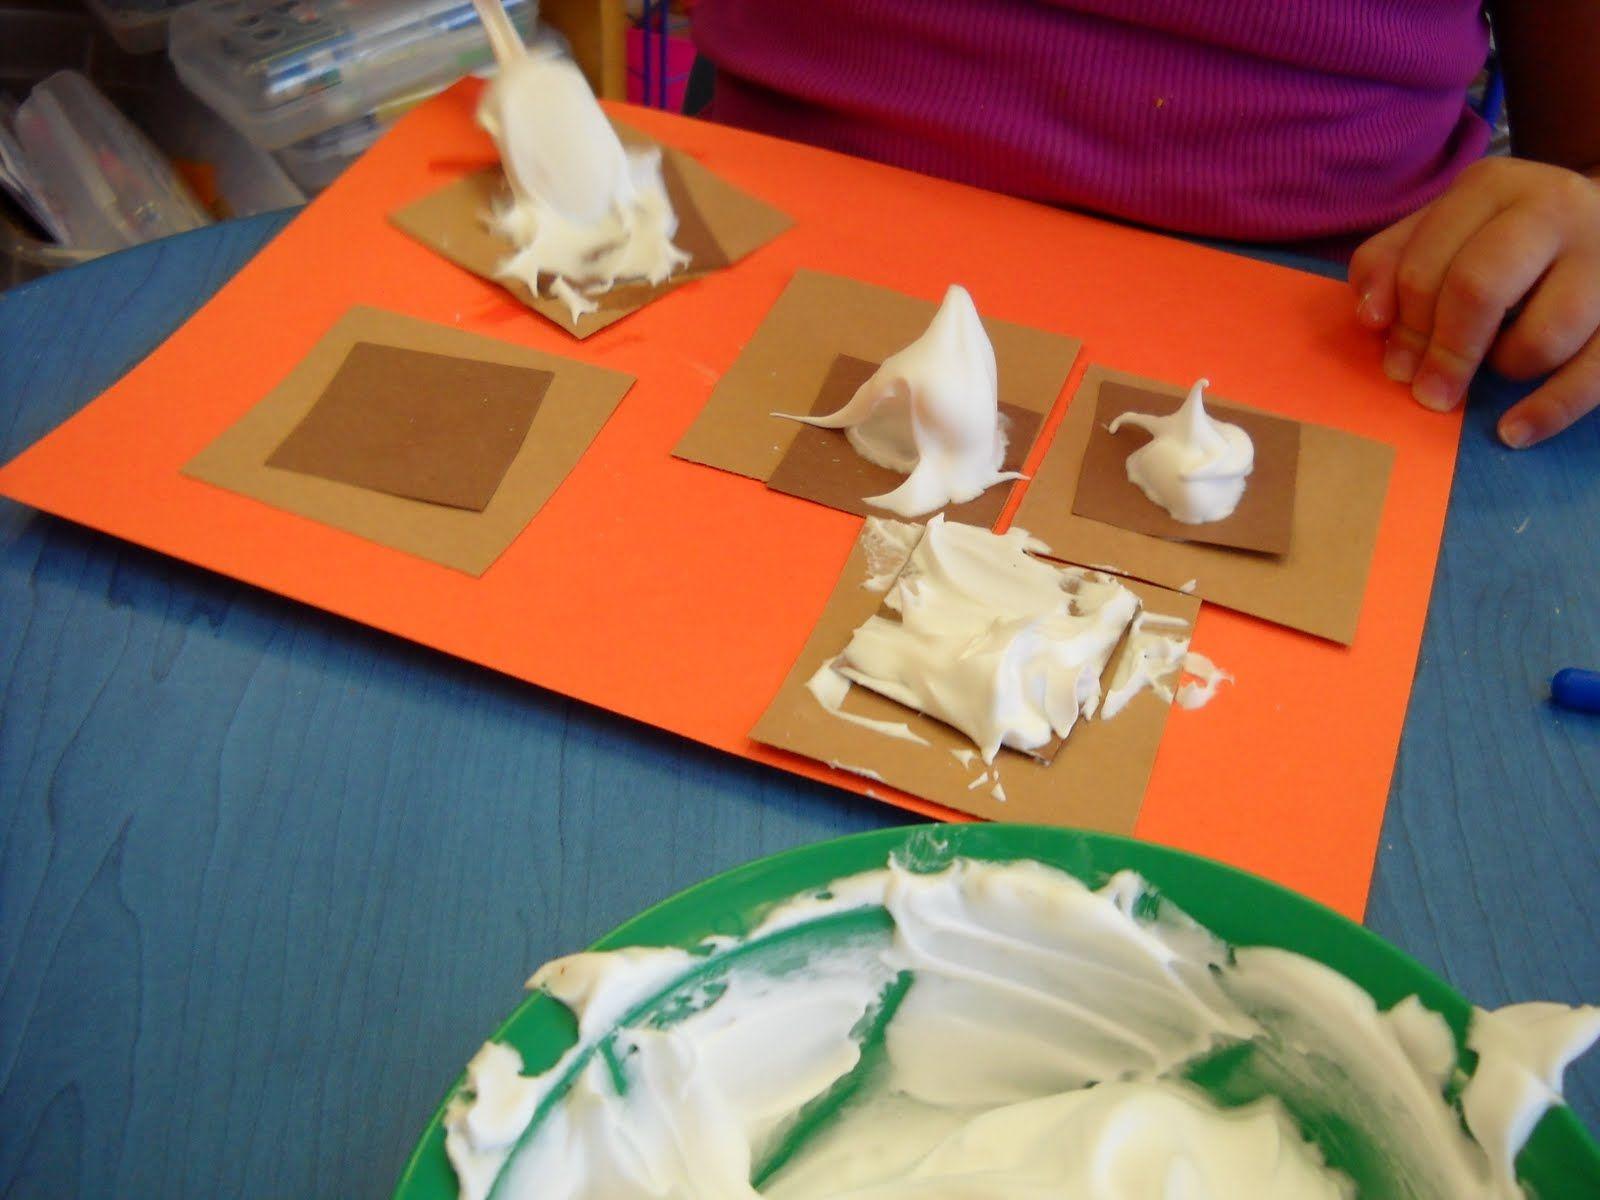 Camp Out Bulletin Board Ideas For Preschool